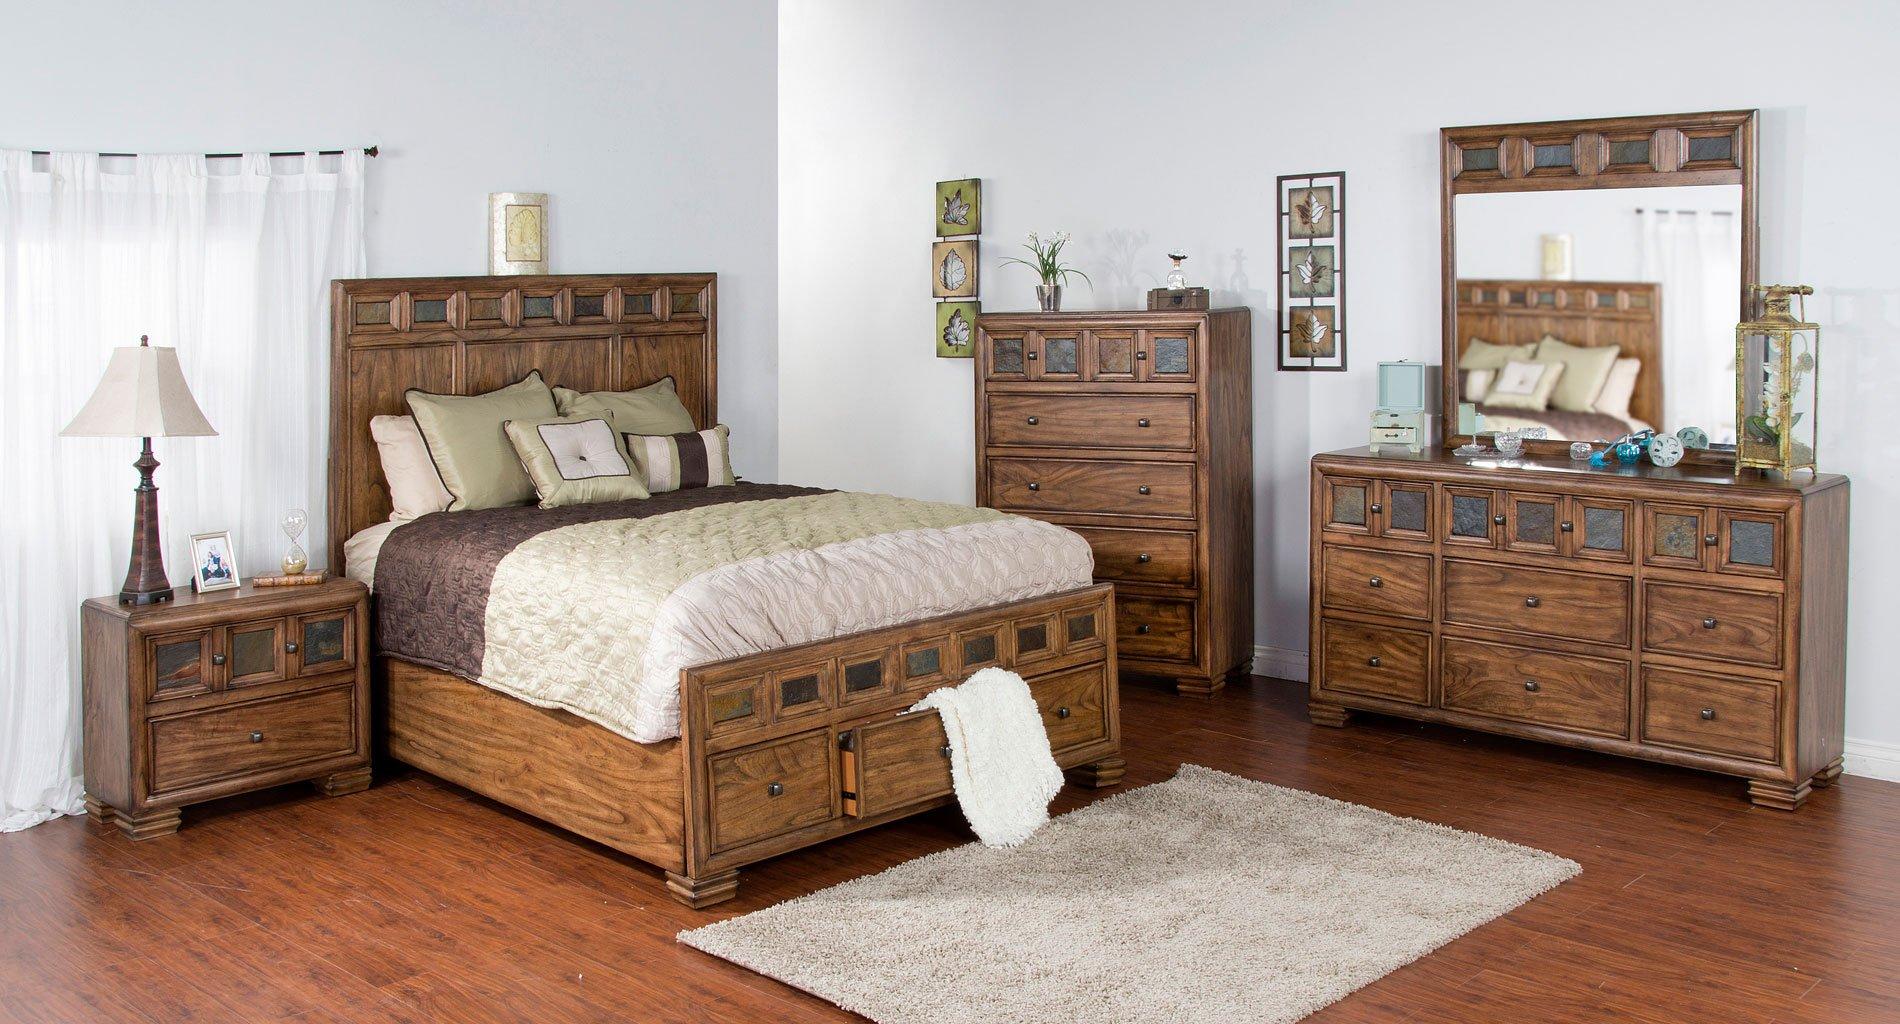 Coventry storage bedroom set sunny designs furniture cart for Sunny designs bedroom furniture